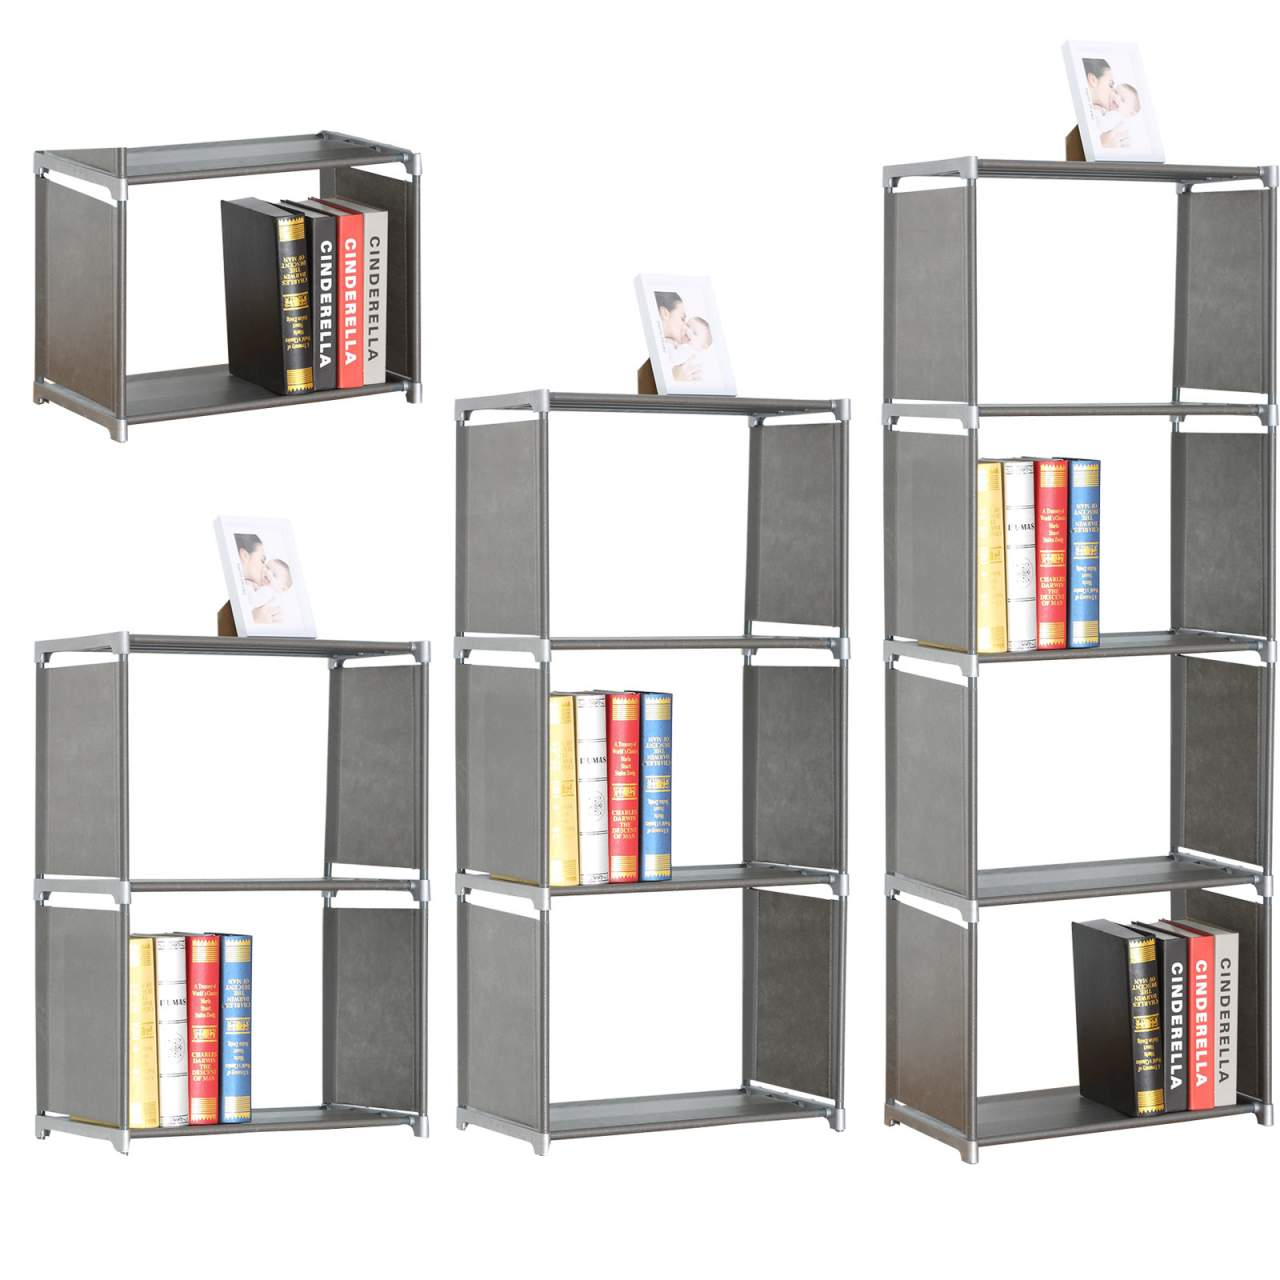 woltu rgb9267sb lagerregal standregal aufbewahrungregal. Black Bedroom Furniture Sets. Home Design Ideas